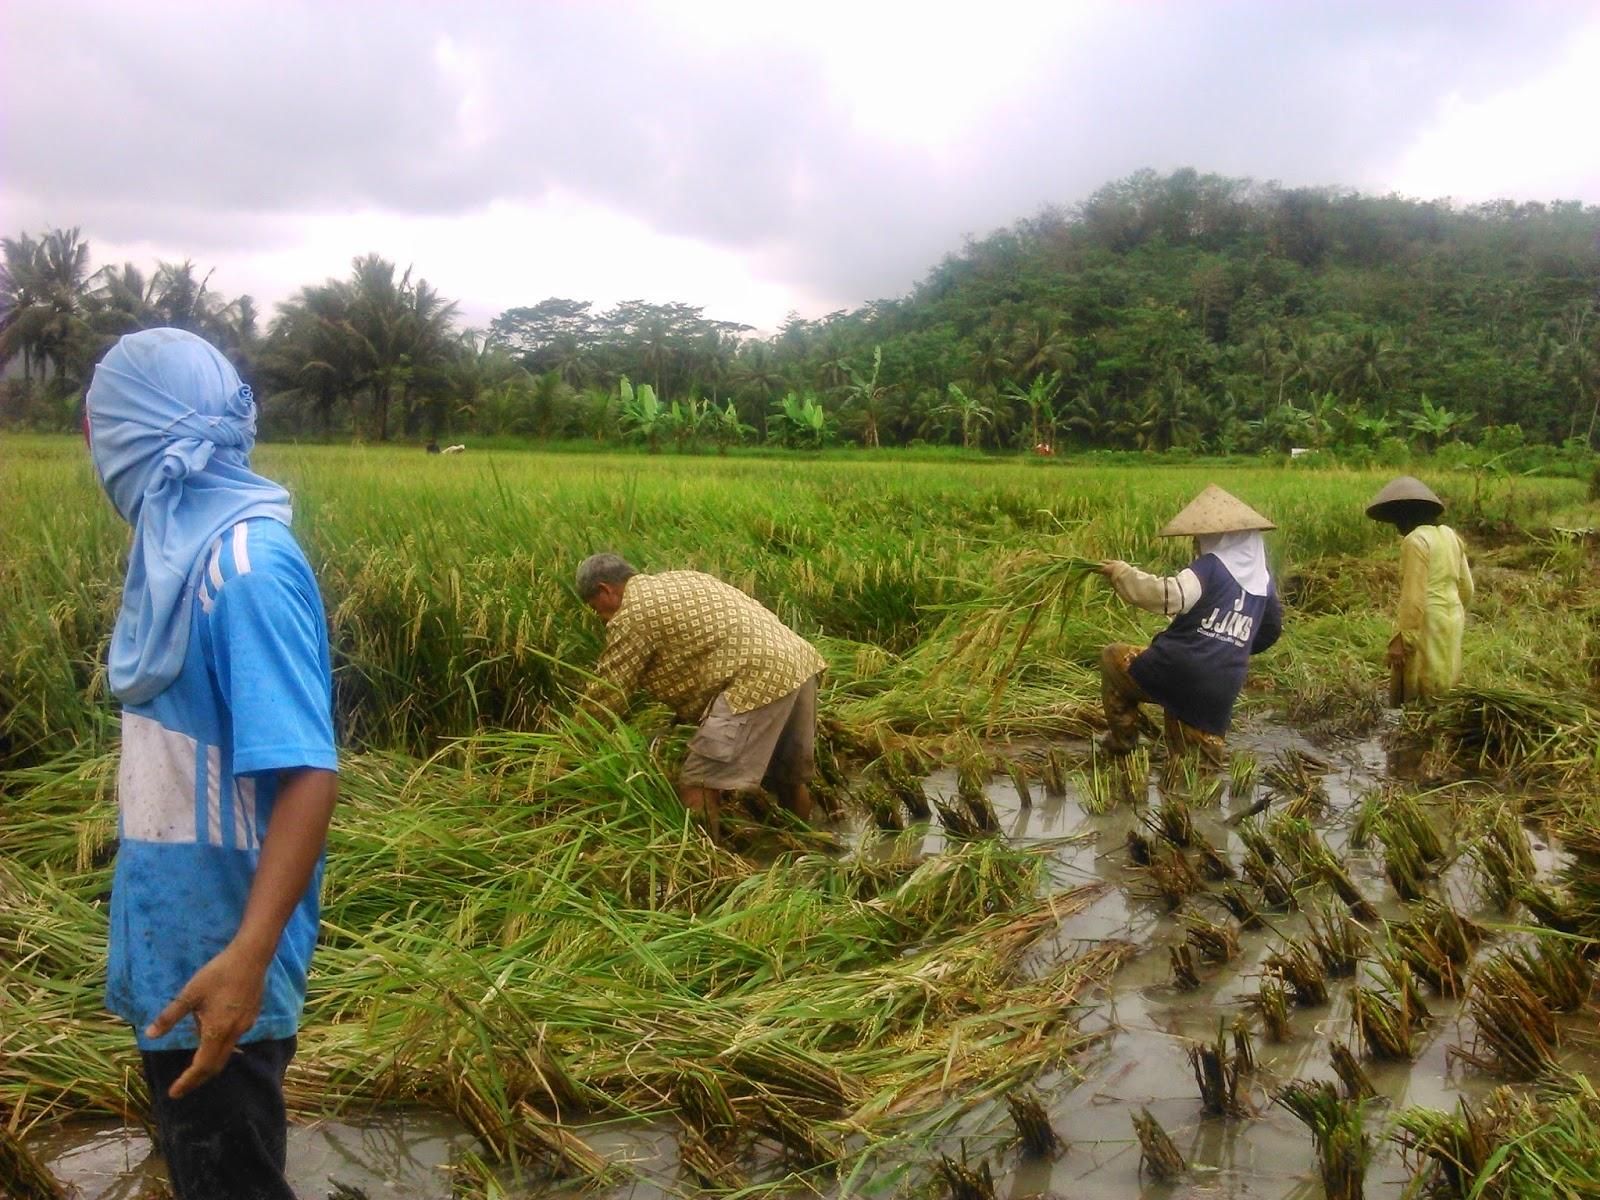 kendala dalam memanen padi